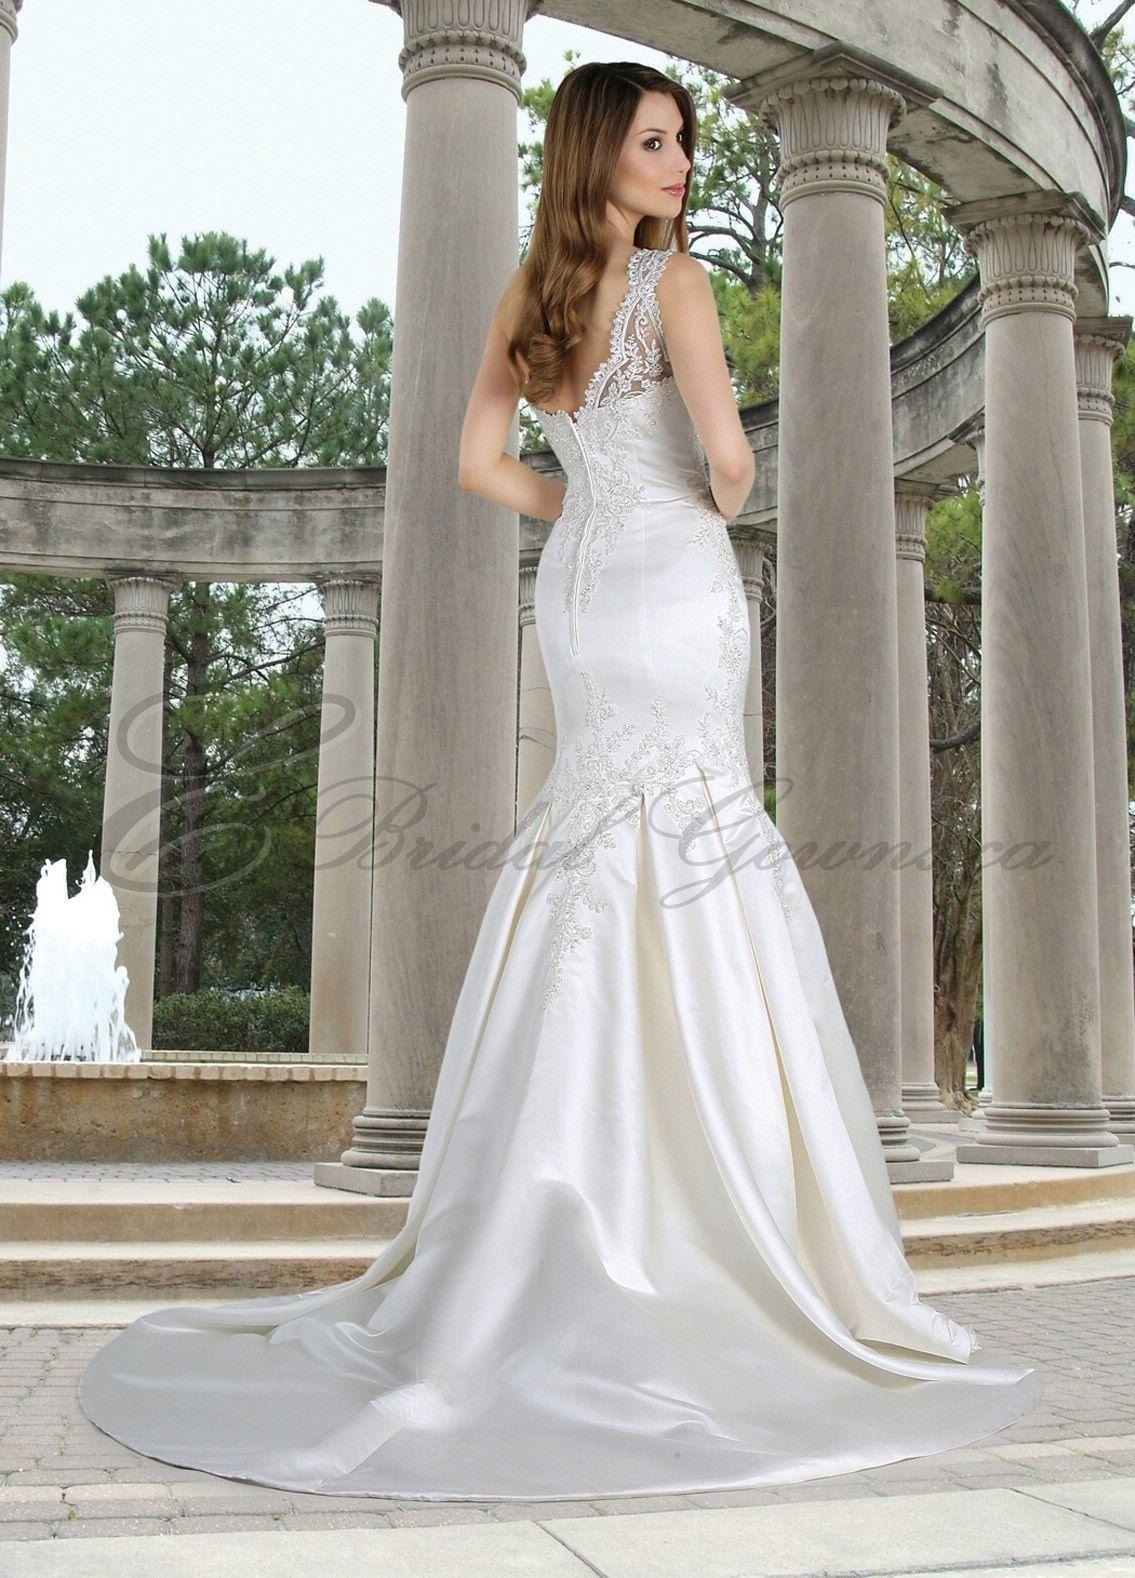 Mermaid Wedding Gowns  Satin OneShoulder Mermaid Wedding Dress